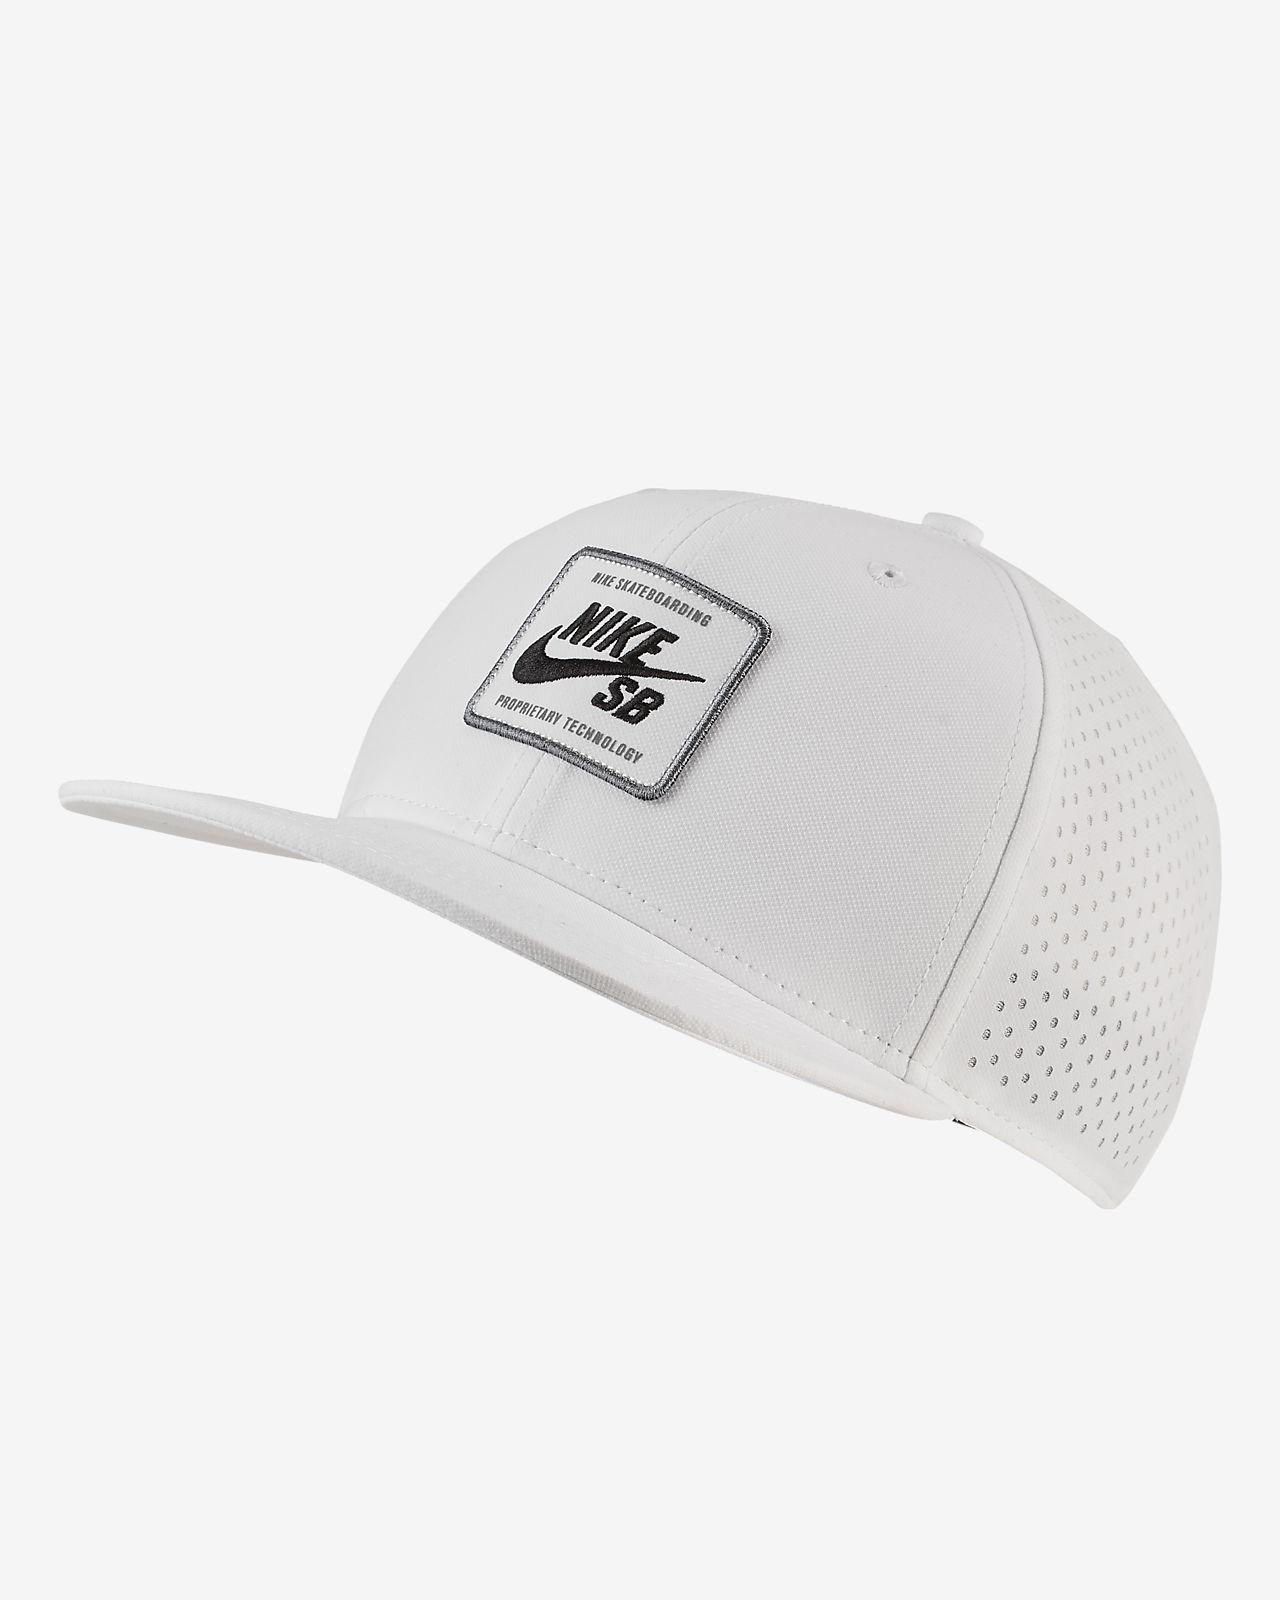 cheap for sale utterly stylish better Nike SB AeroBill Pro 2.0 Skate Hat